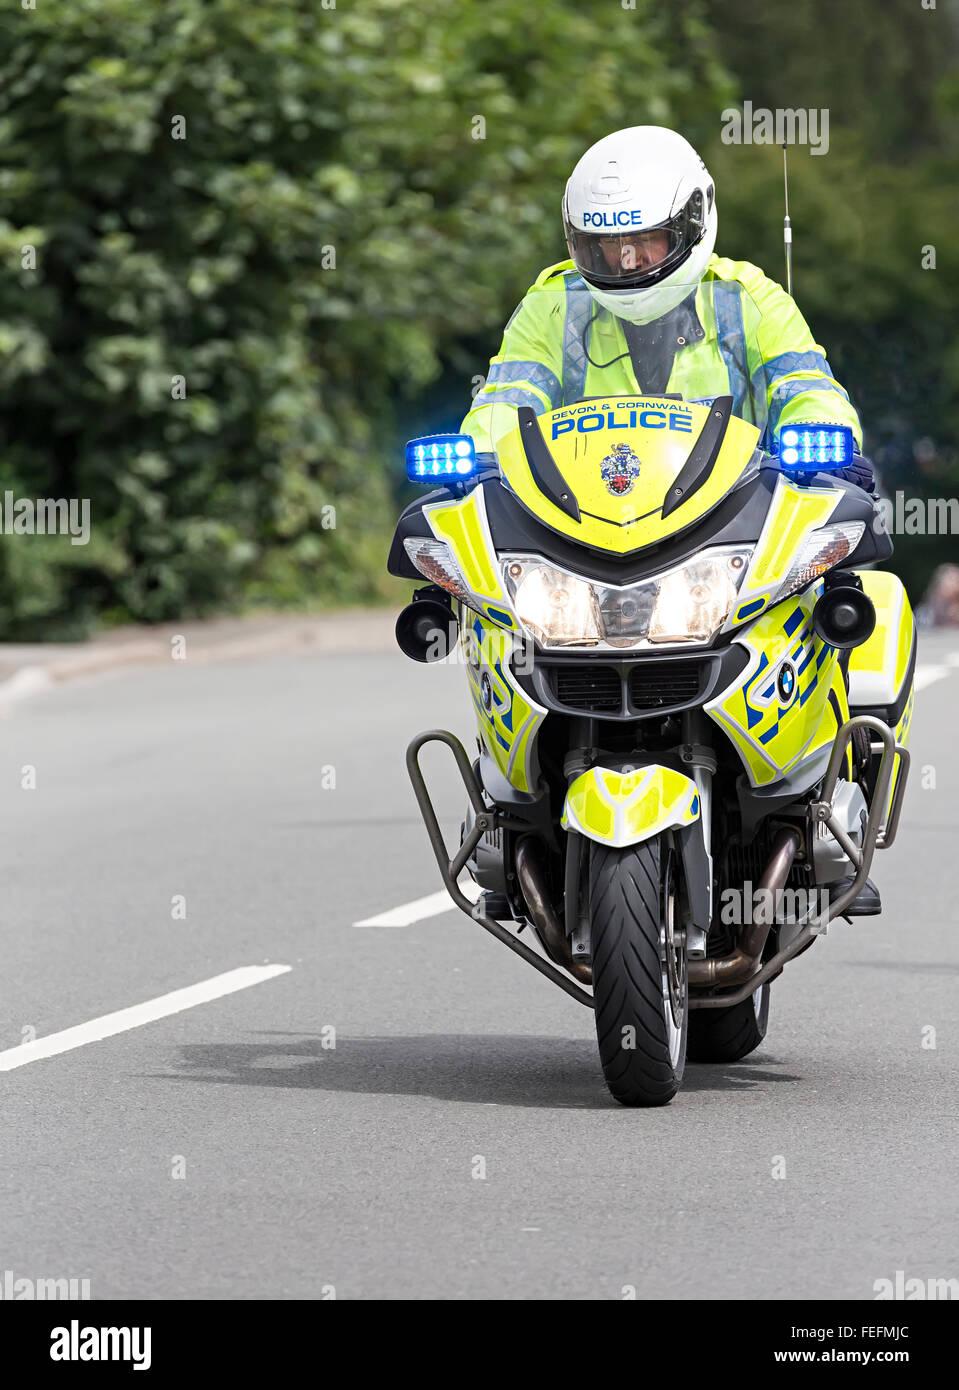 Police motorbike at the Velothon cycle race, Llanfoist, Wales, UK - Stock Image